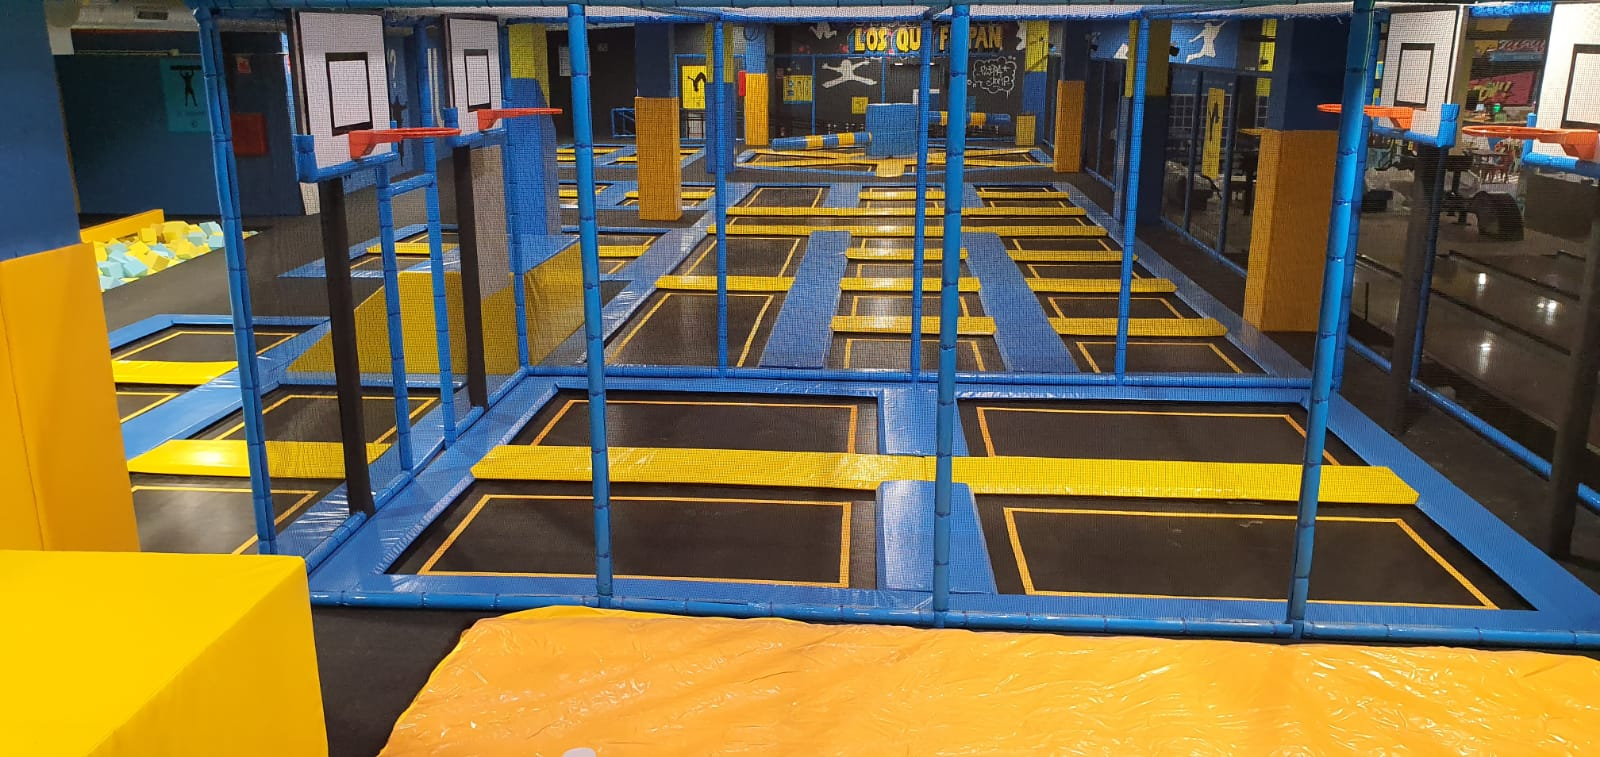 parques deportivos camas elasticas baloncesto